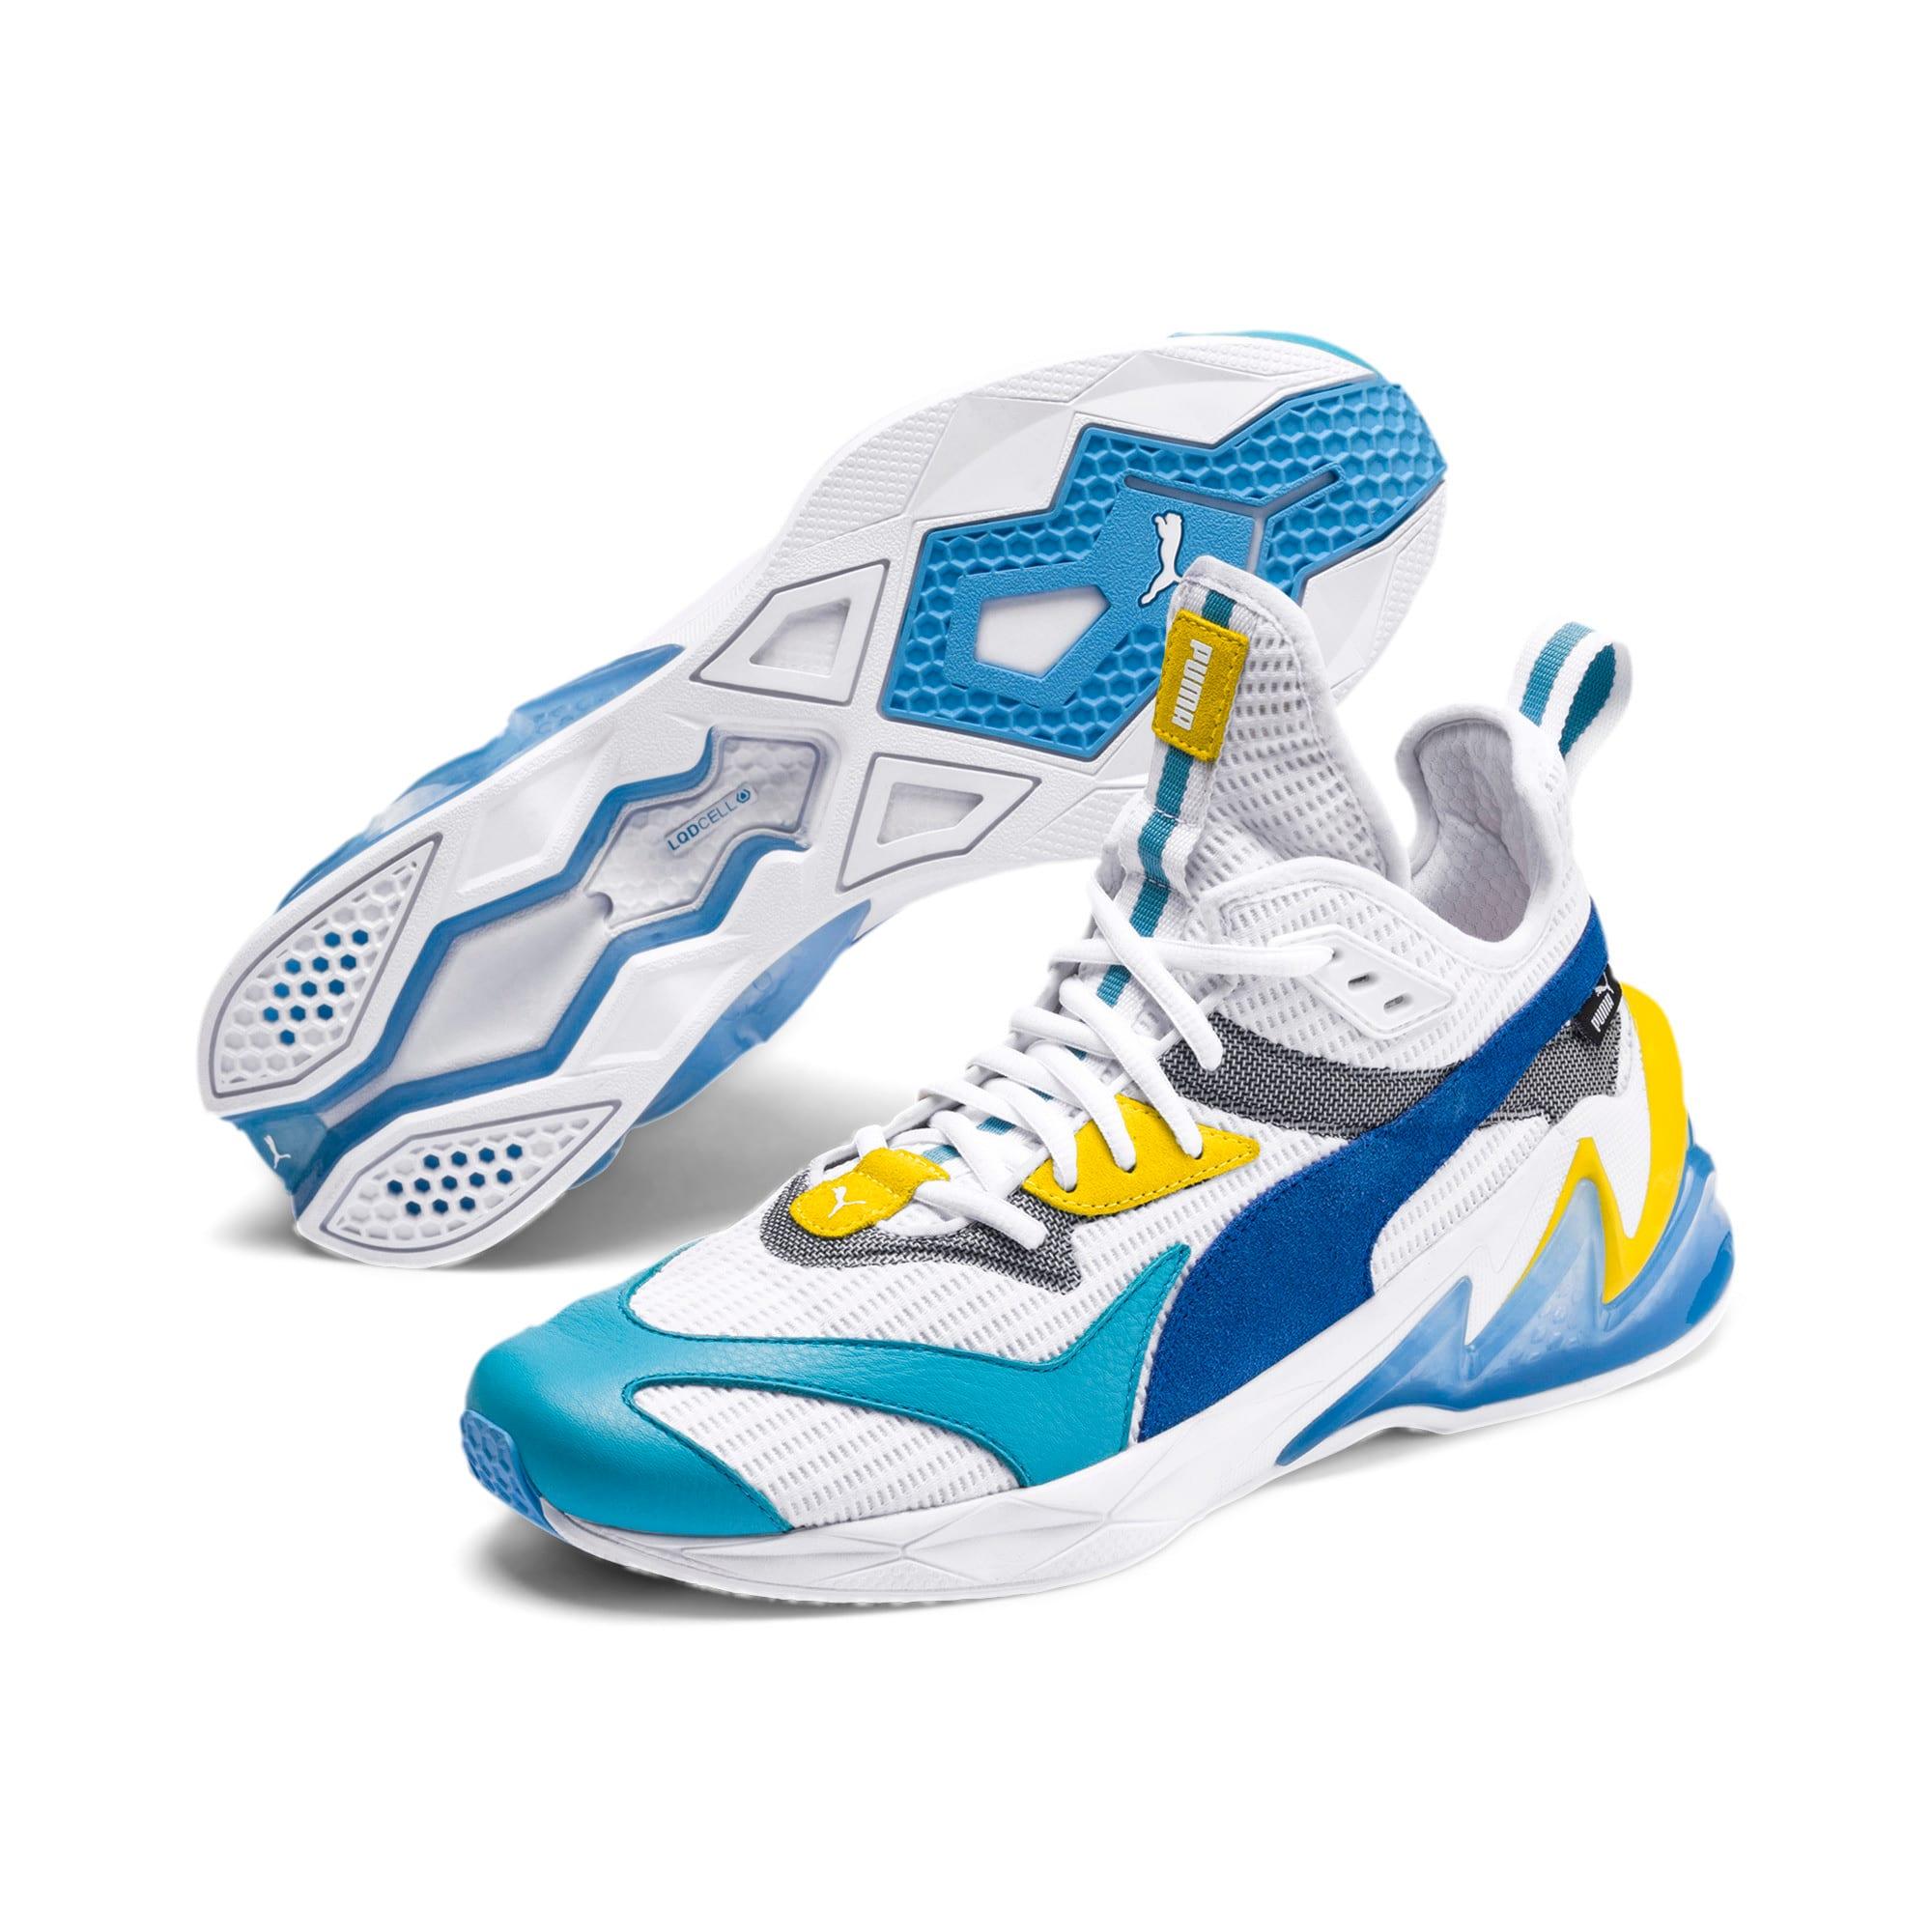 Thumbnail 2 of LQDCELL Origin Herren Sneaker, Puma White-B Blue-Blz Yellow, medium